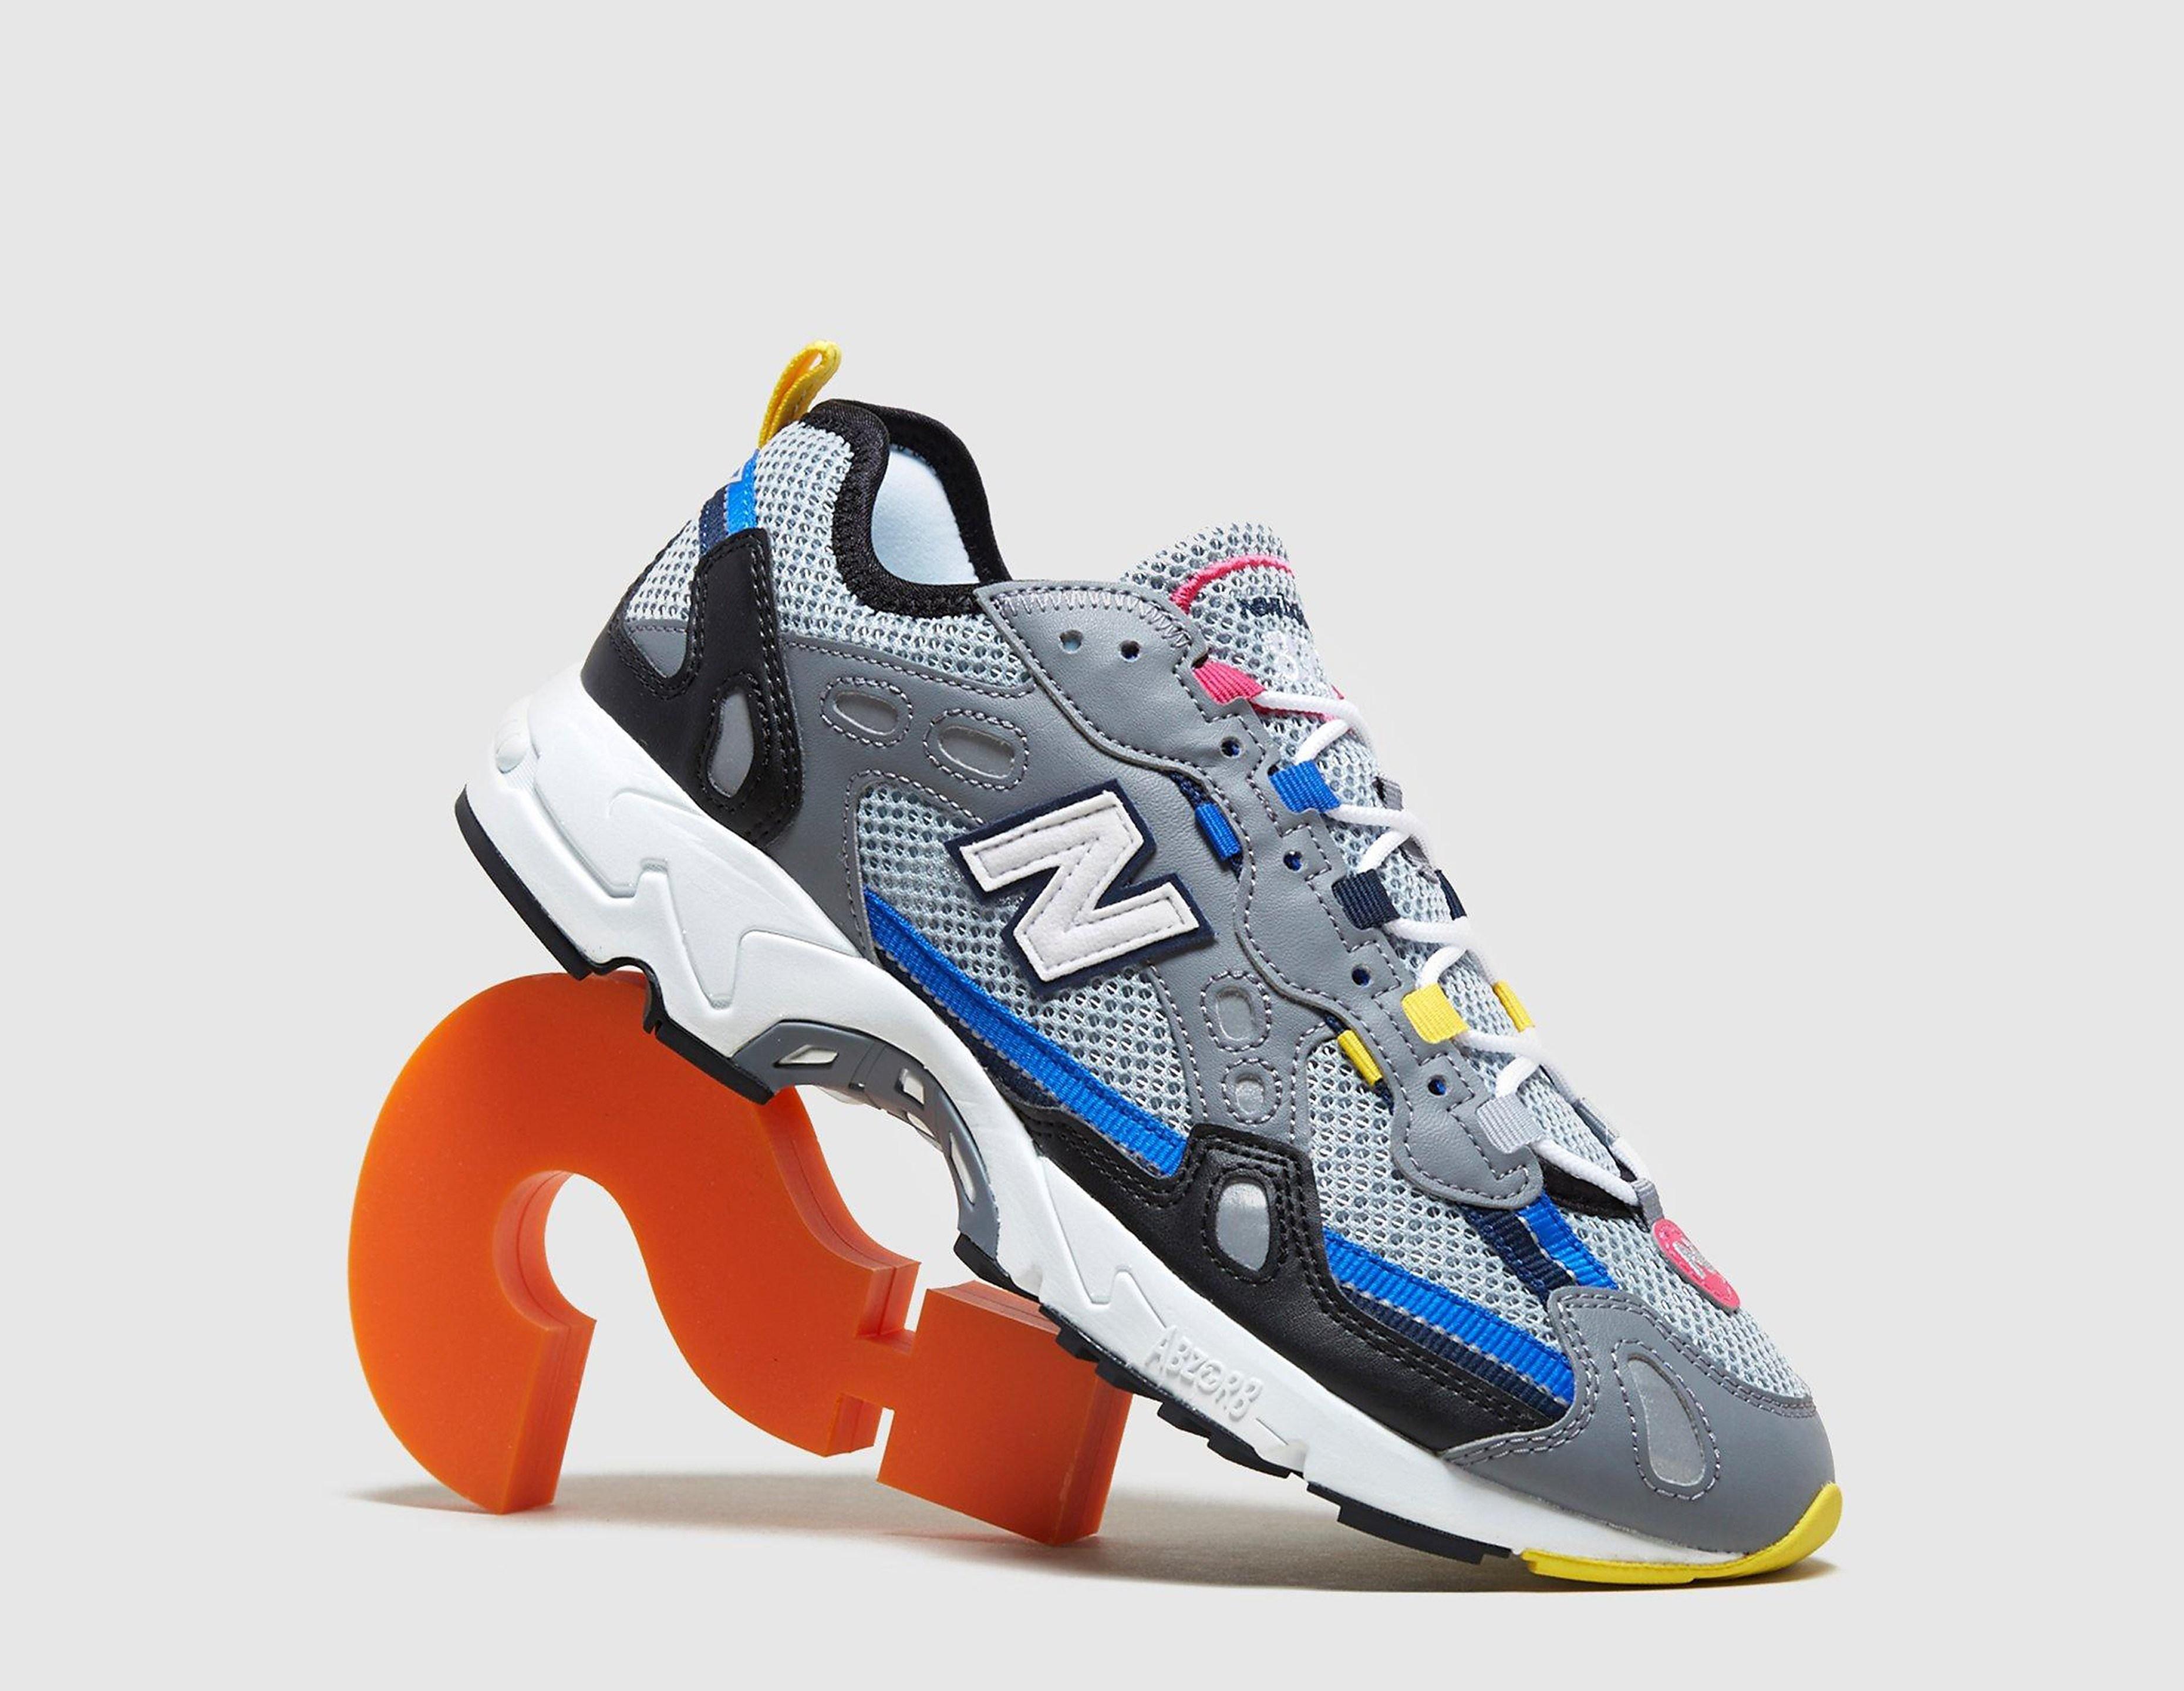 New Balance 827, WHT/BLU-YEL/WHT/BLU-YEL